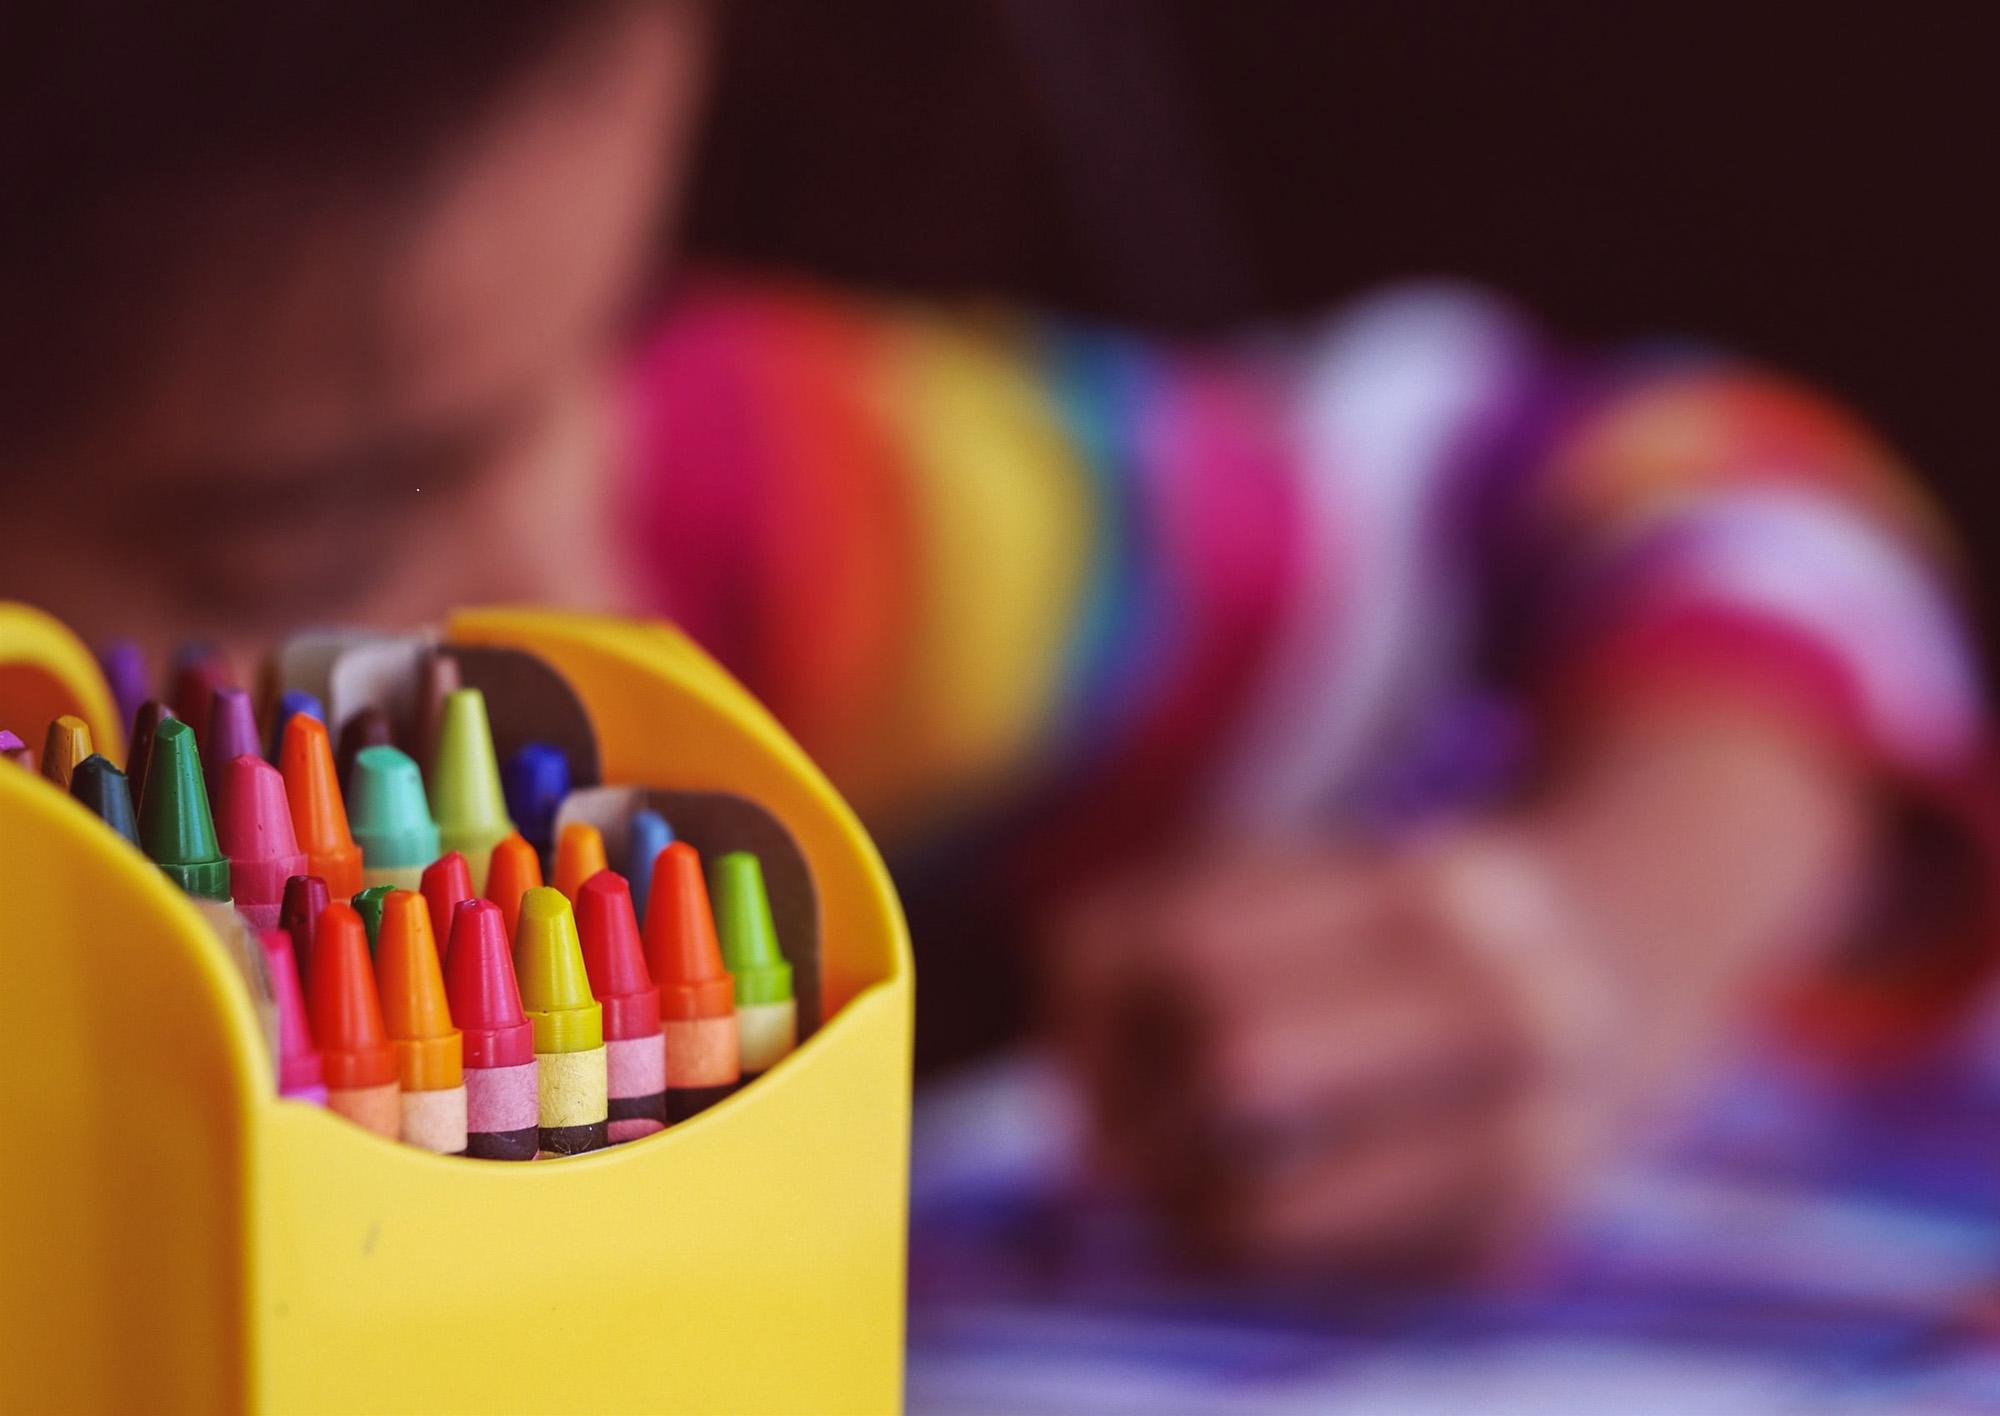 20-reasons-why-we-homeschool-1